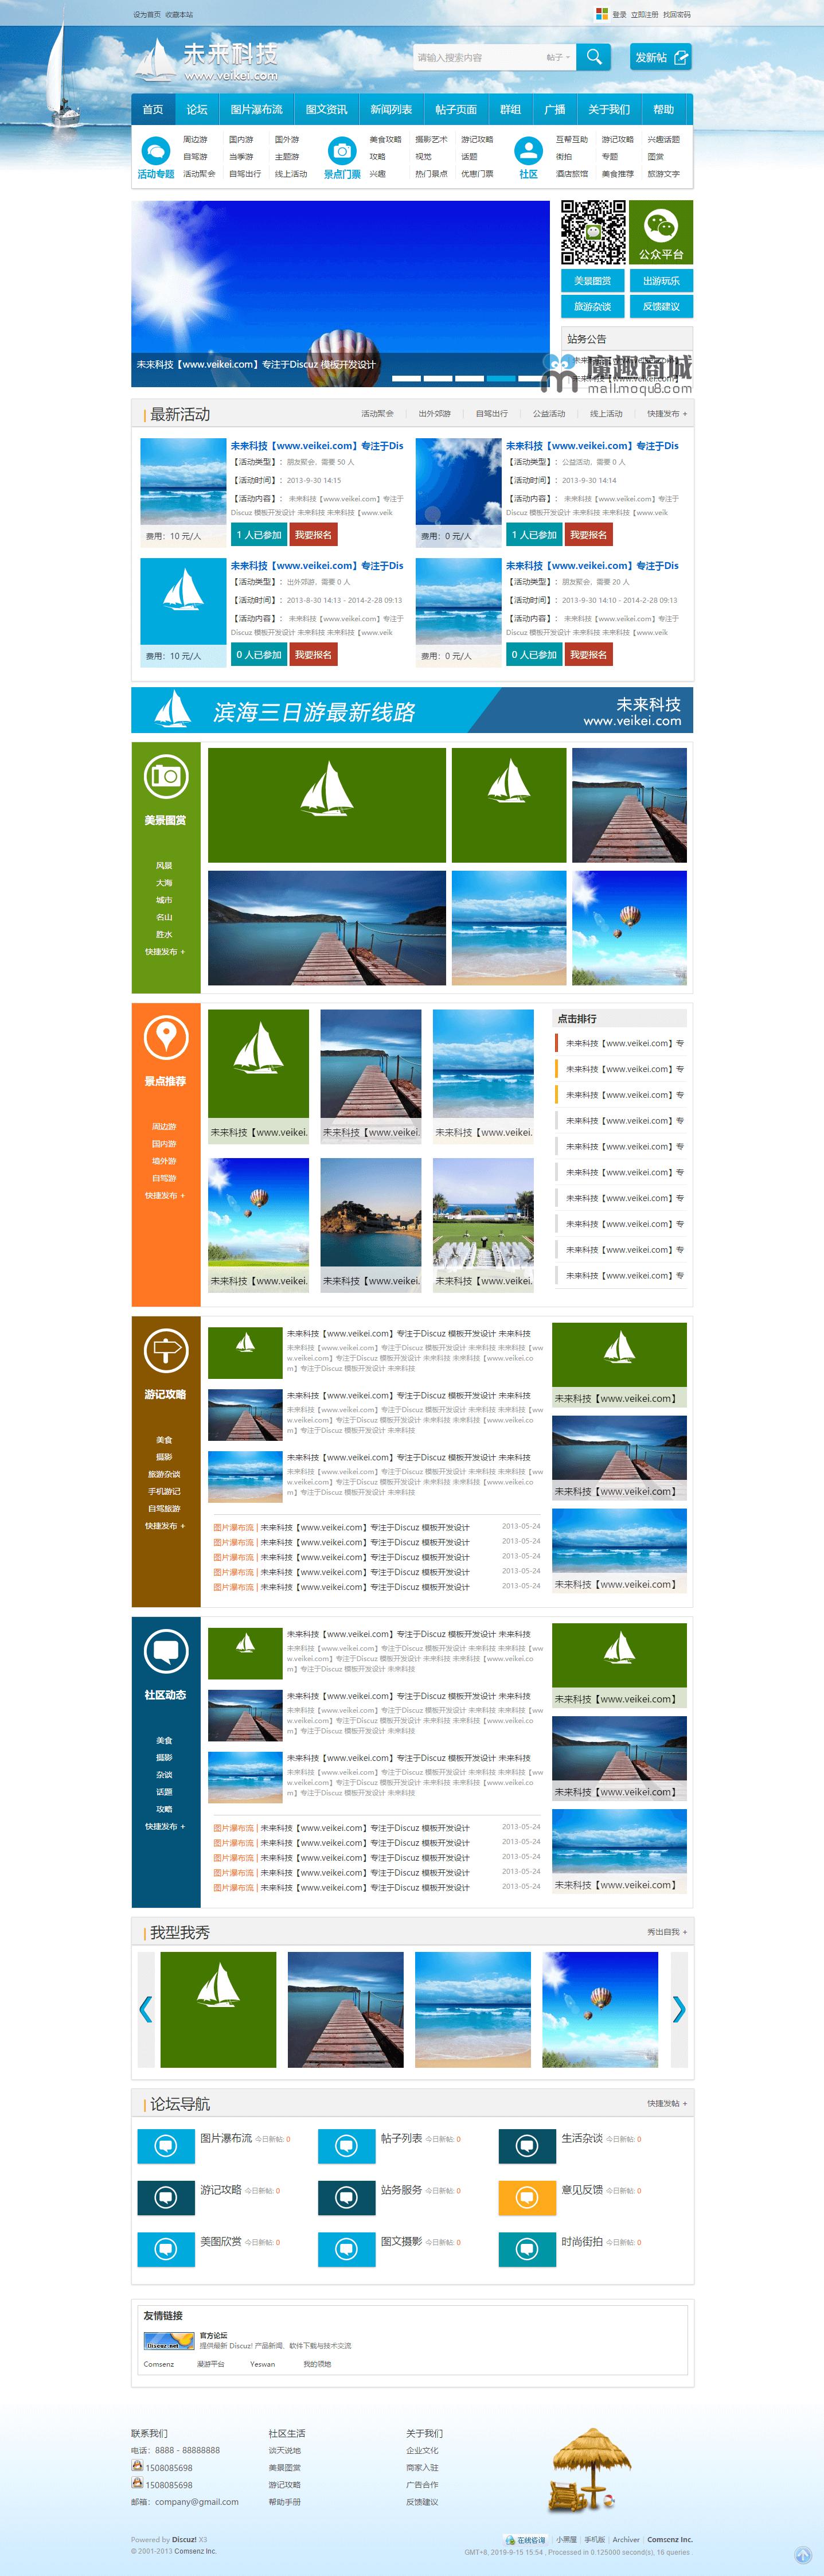 <b><font color='#44BB44'>魔趣7色质感科技资讯质感设计门户模版</font></b>